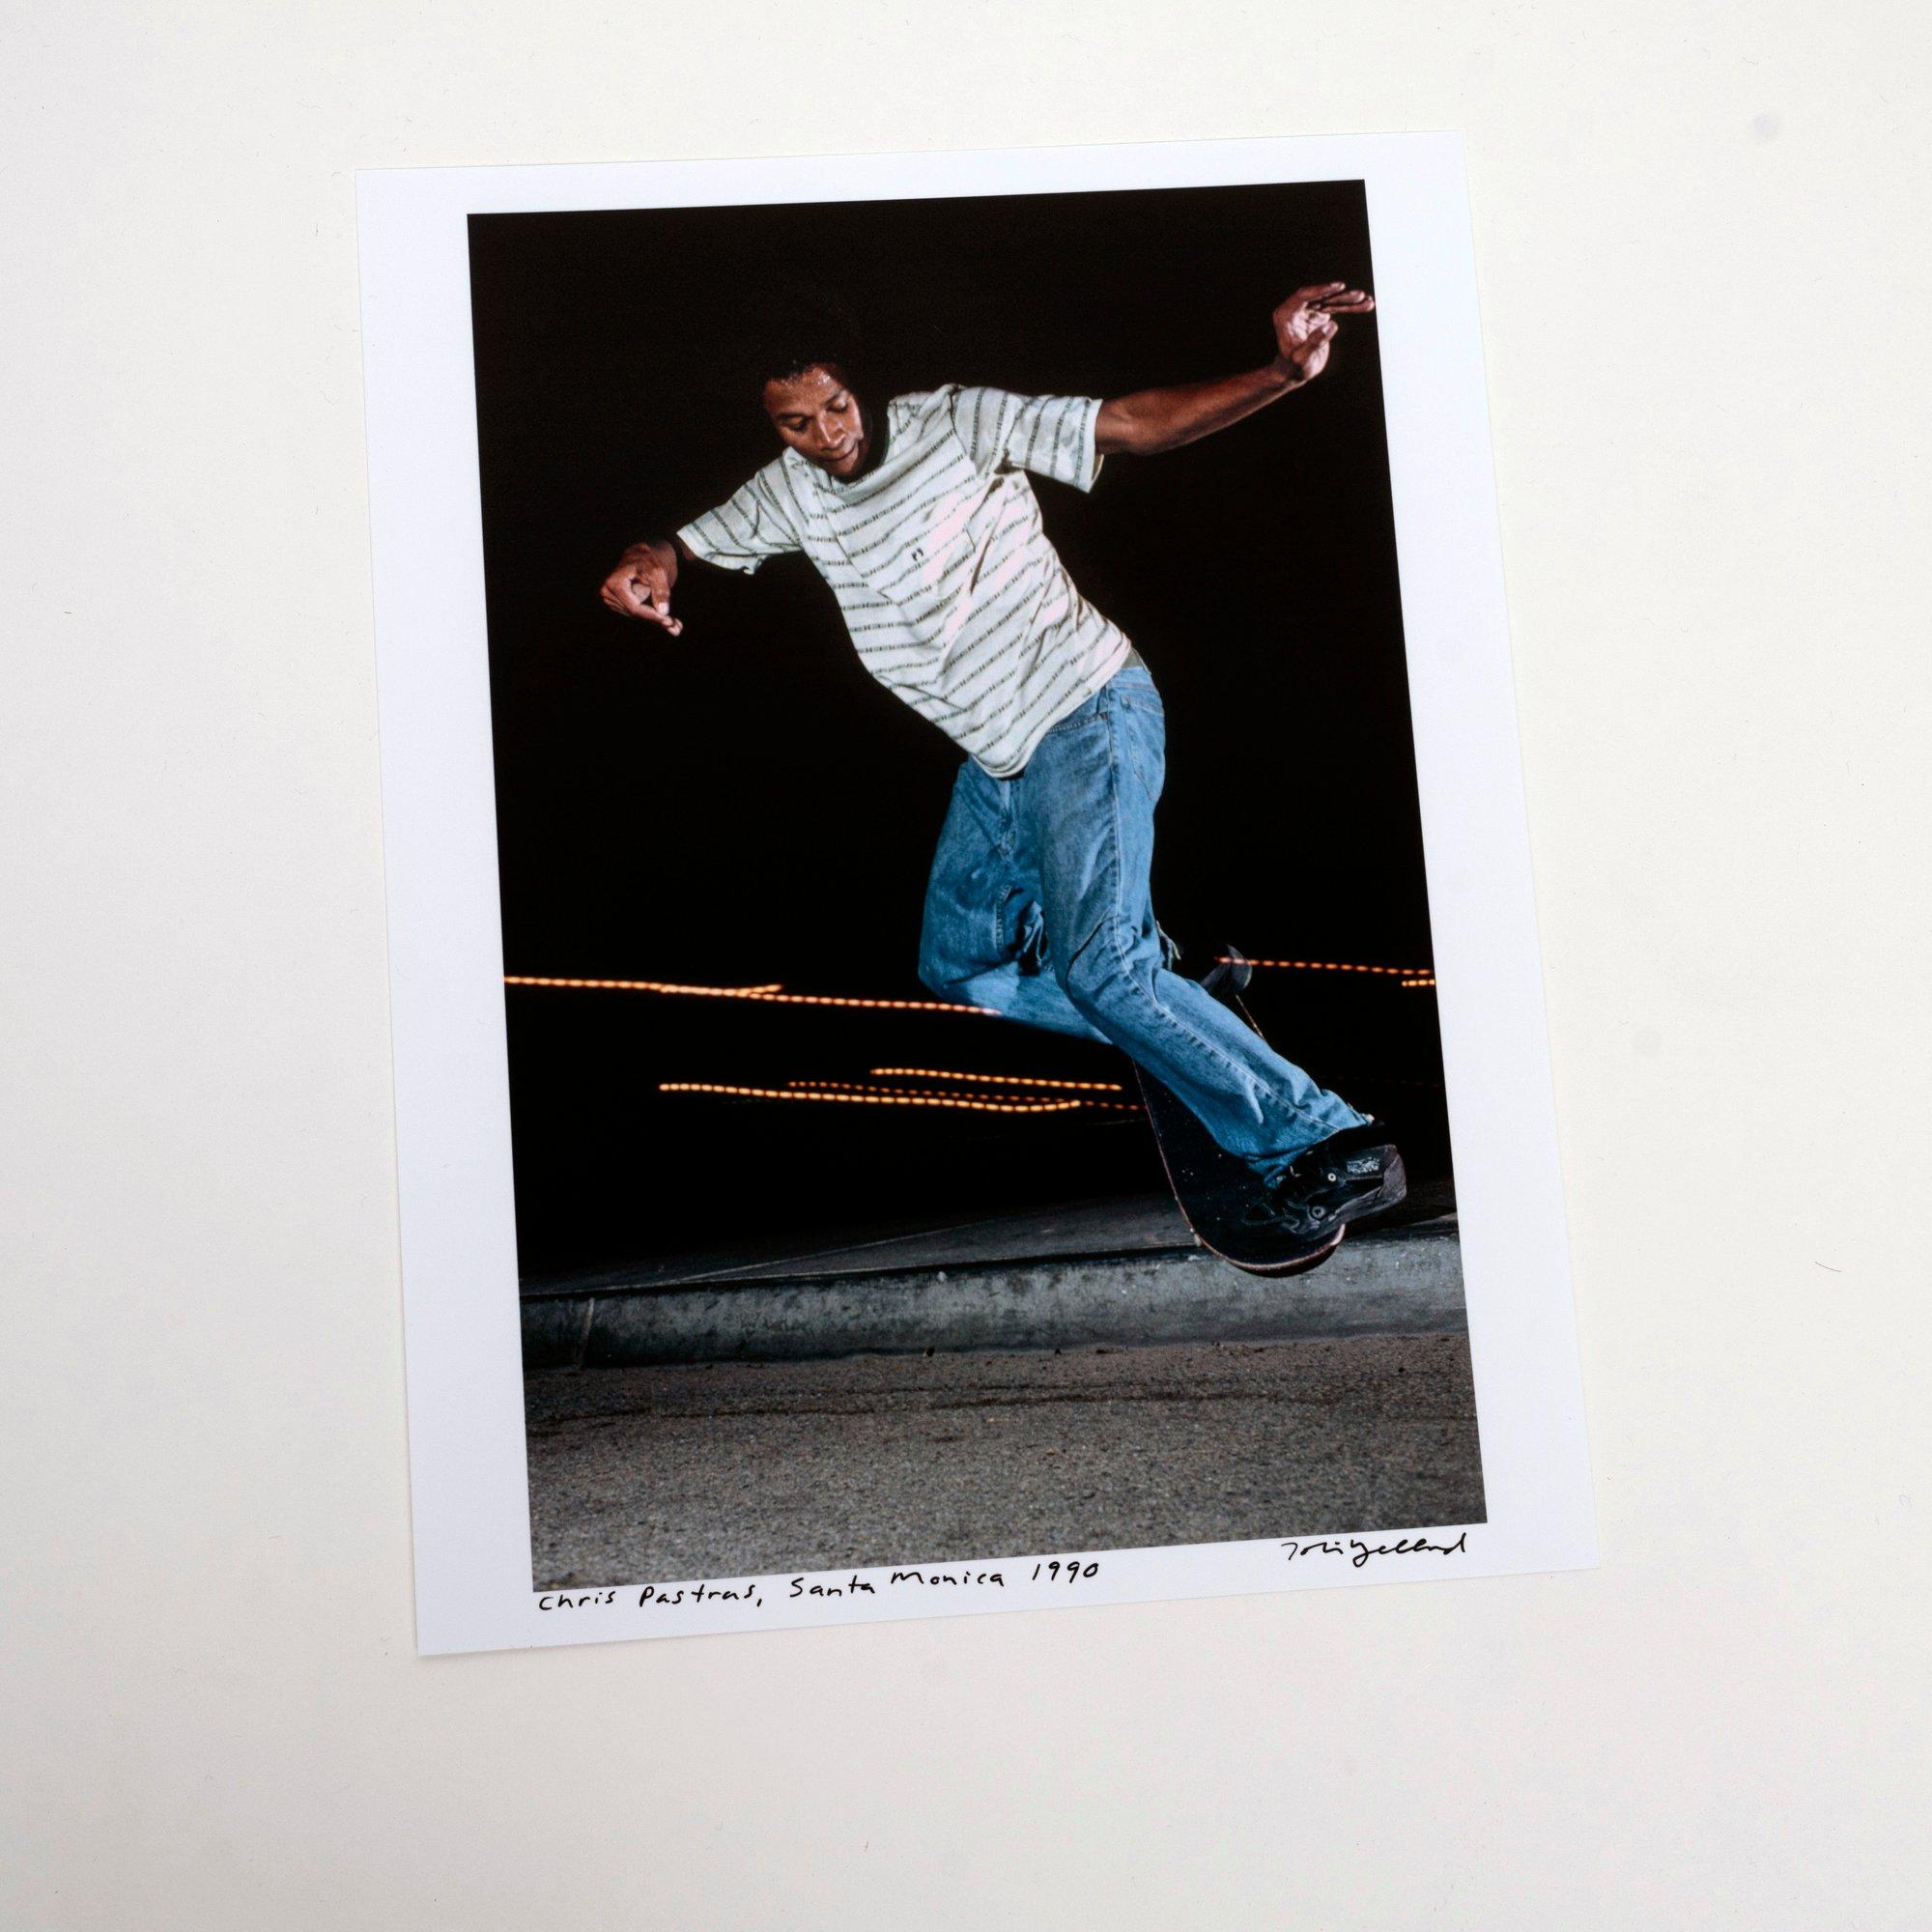 Image of Chris Pastras, Santa Monica 1991, by Tobin Yelland